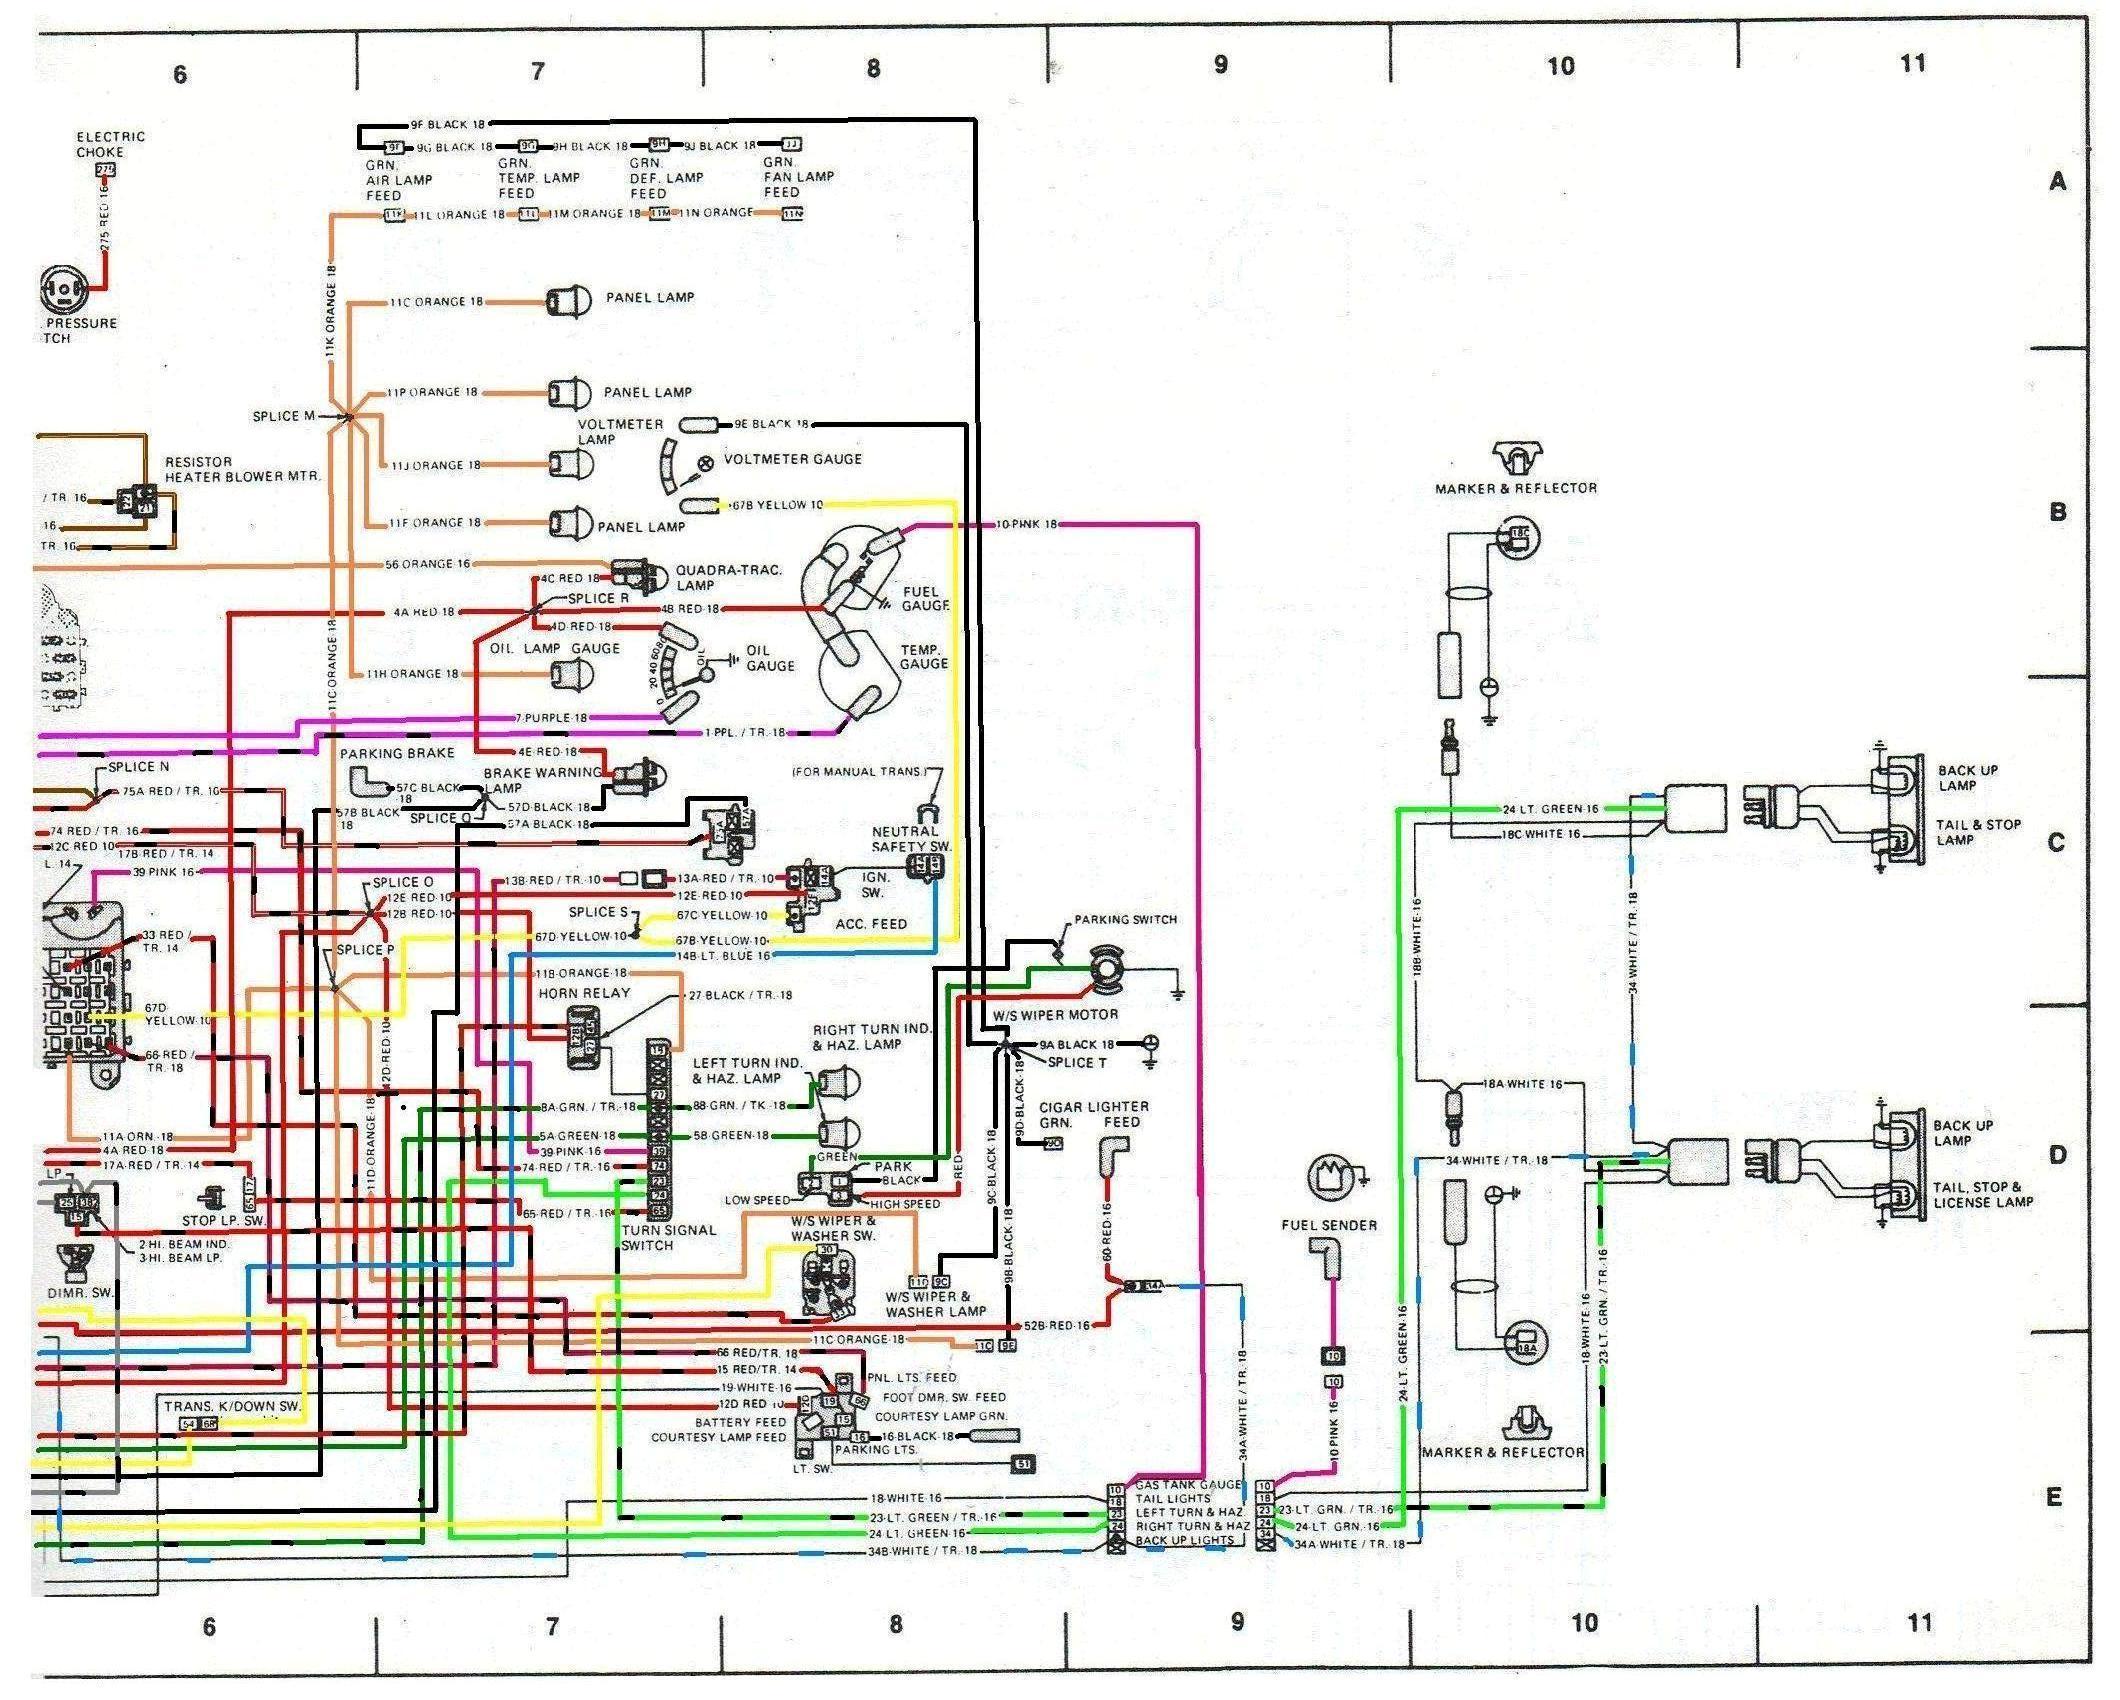 hy_7567] jeep cj7 fuel gauge wiring diagram as well jeep cj7 258 vacuum diagram  wiring diagram  sarc basi pneu coun boapu mohammedshrine librar wiring 101